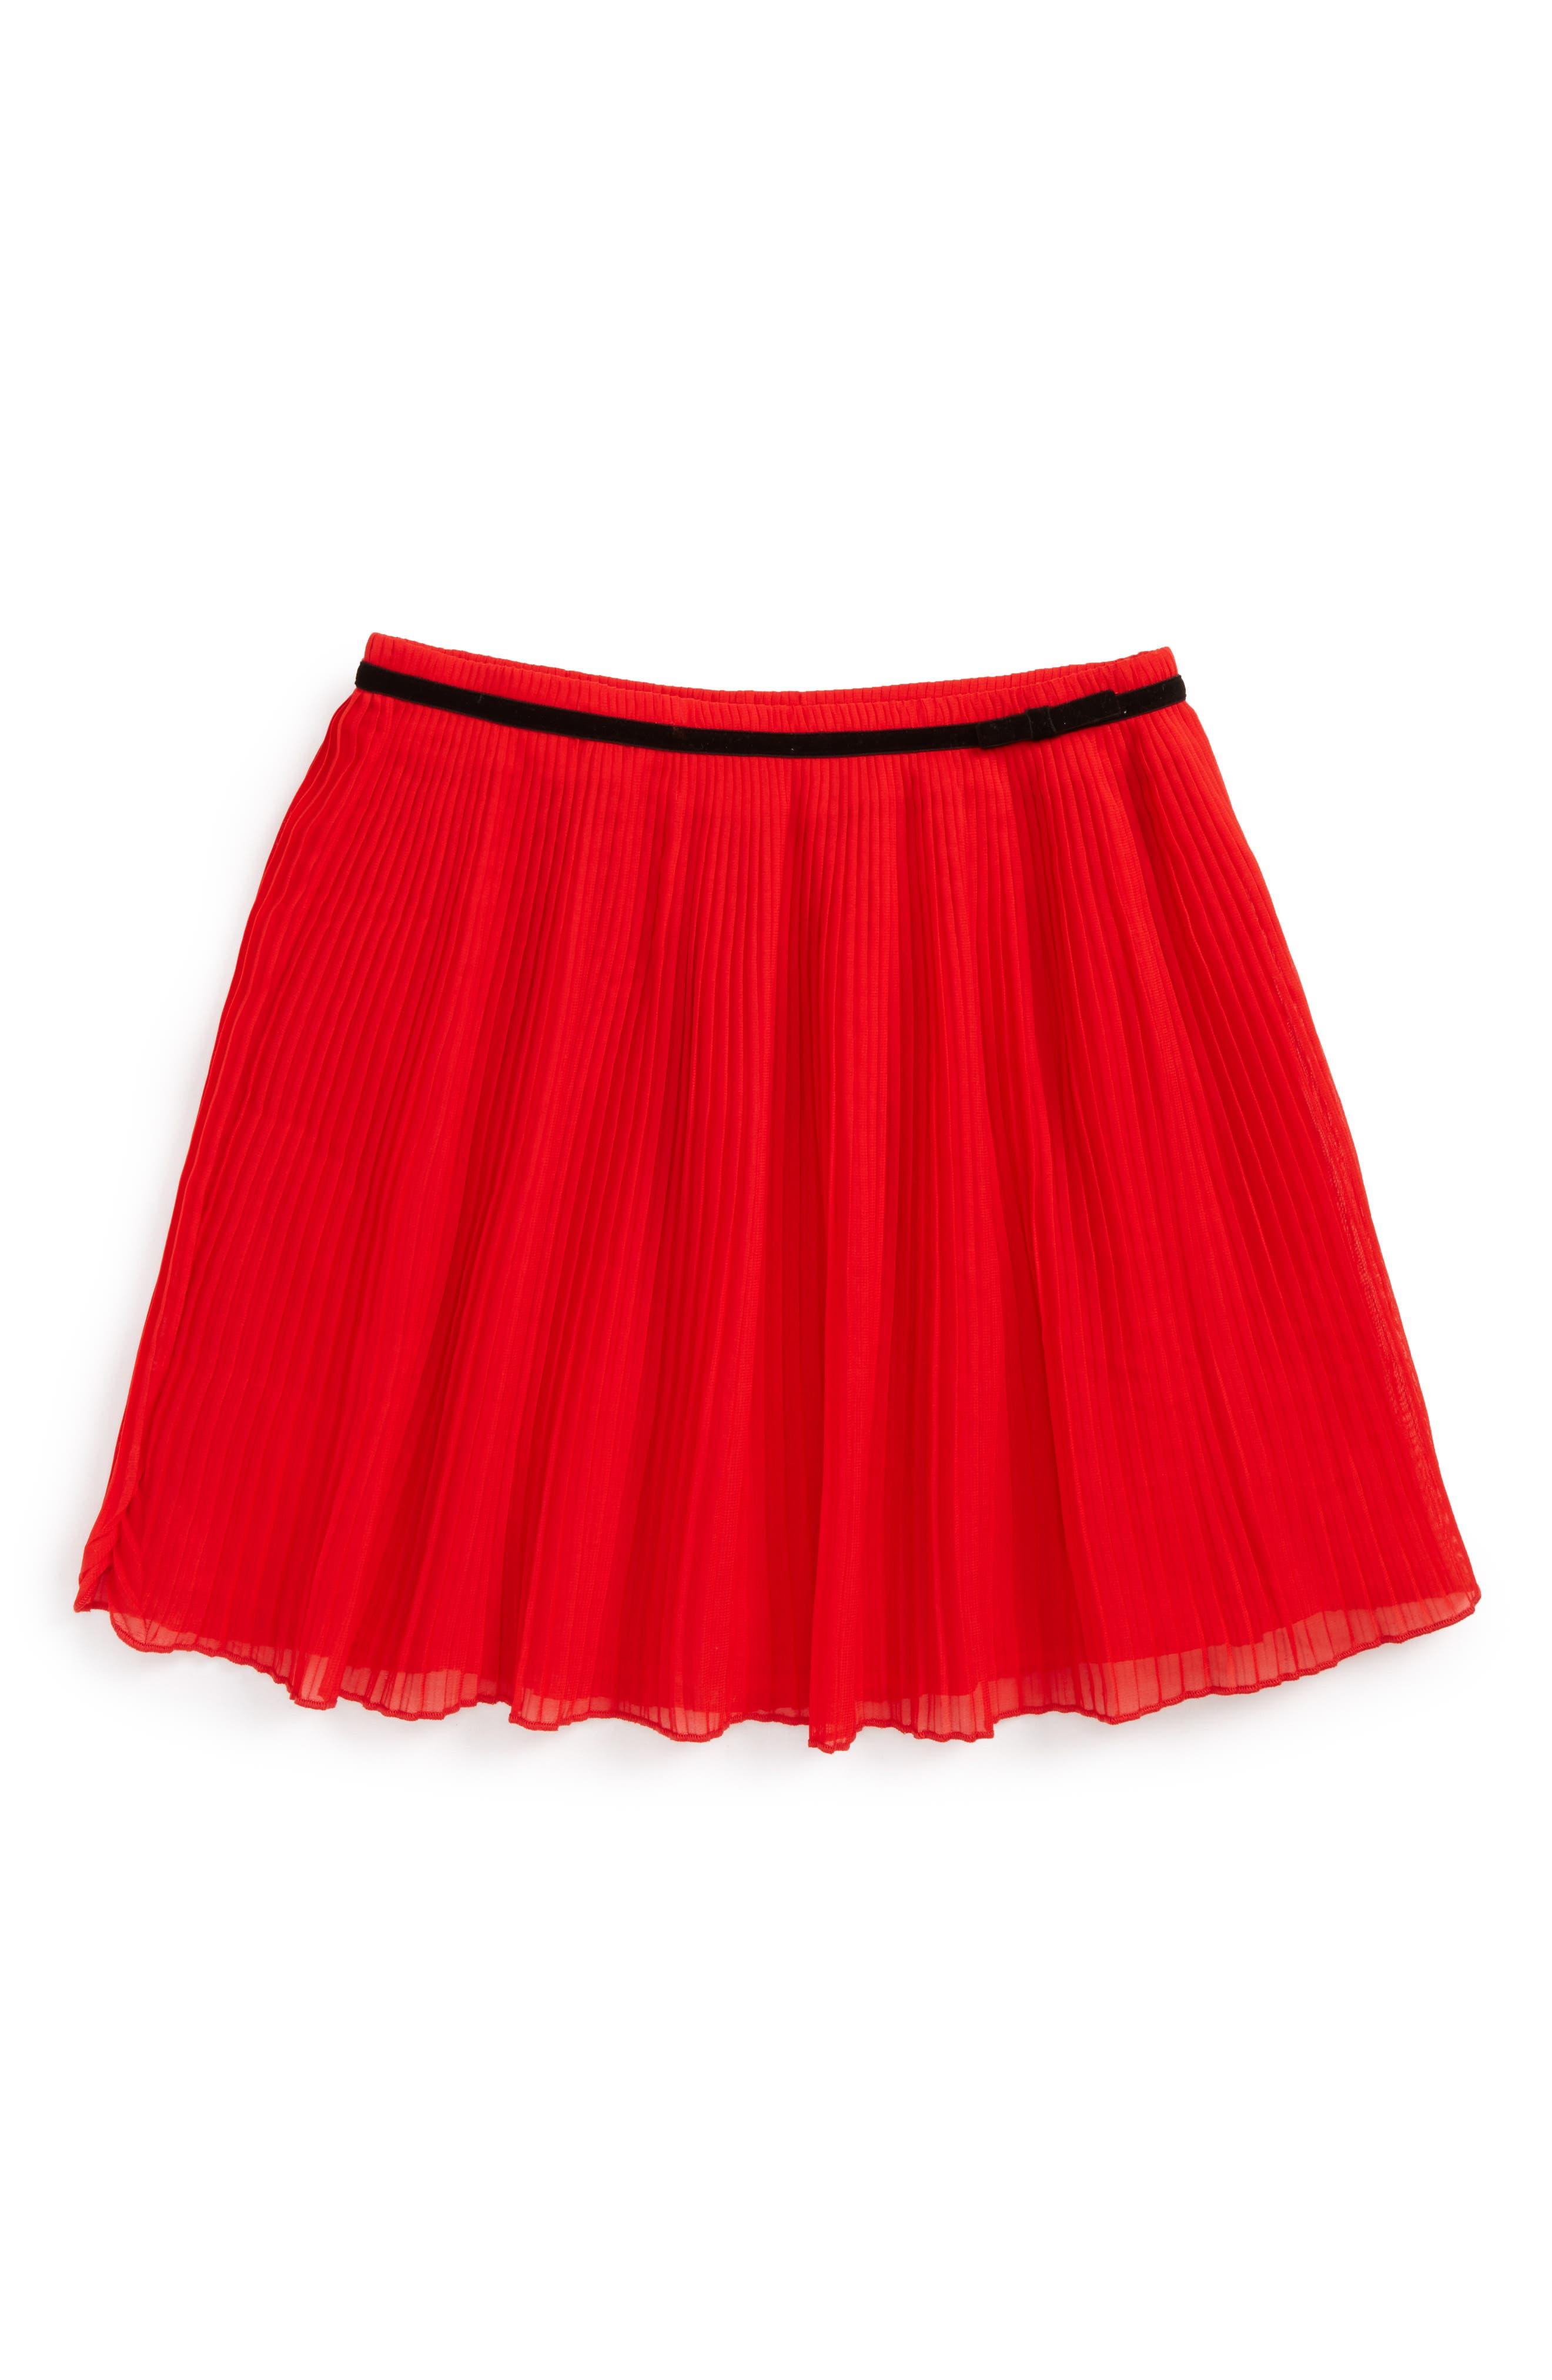 kate spade new york pleated chiffon skirt (Big Girls)